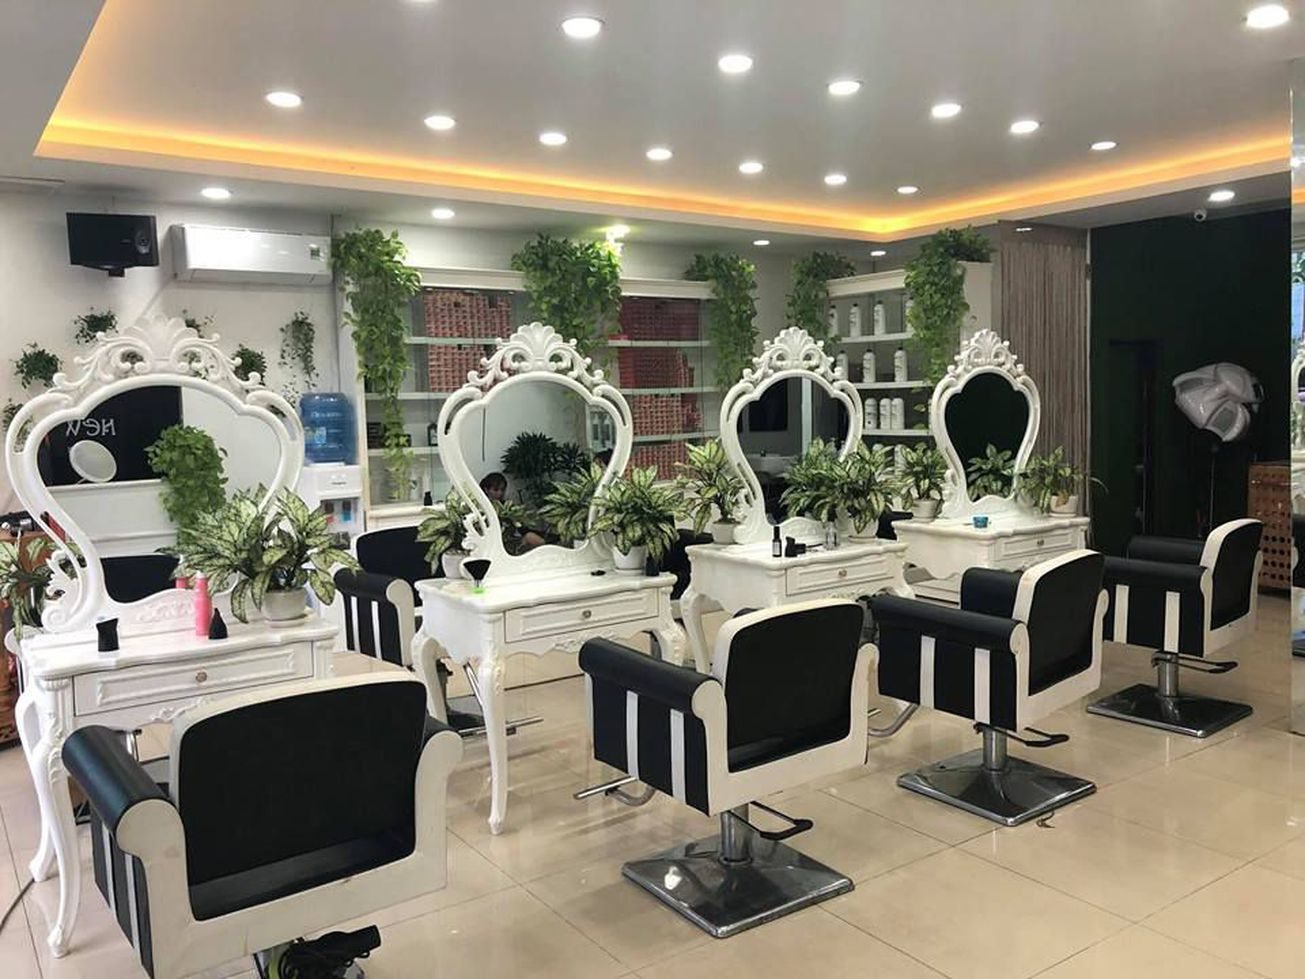 Beauty Salon Tóc Mới 0 gallaries